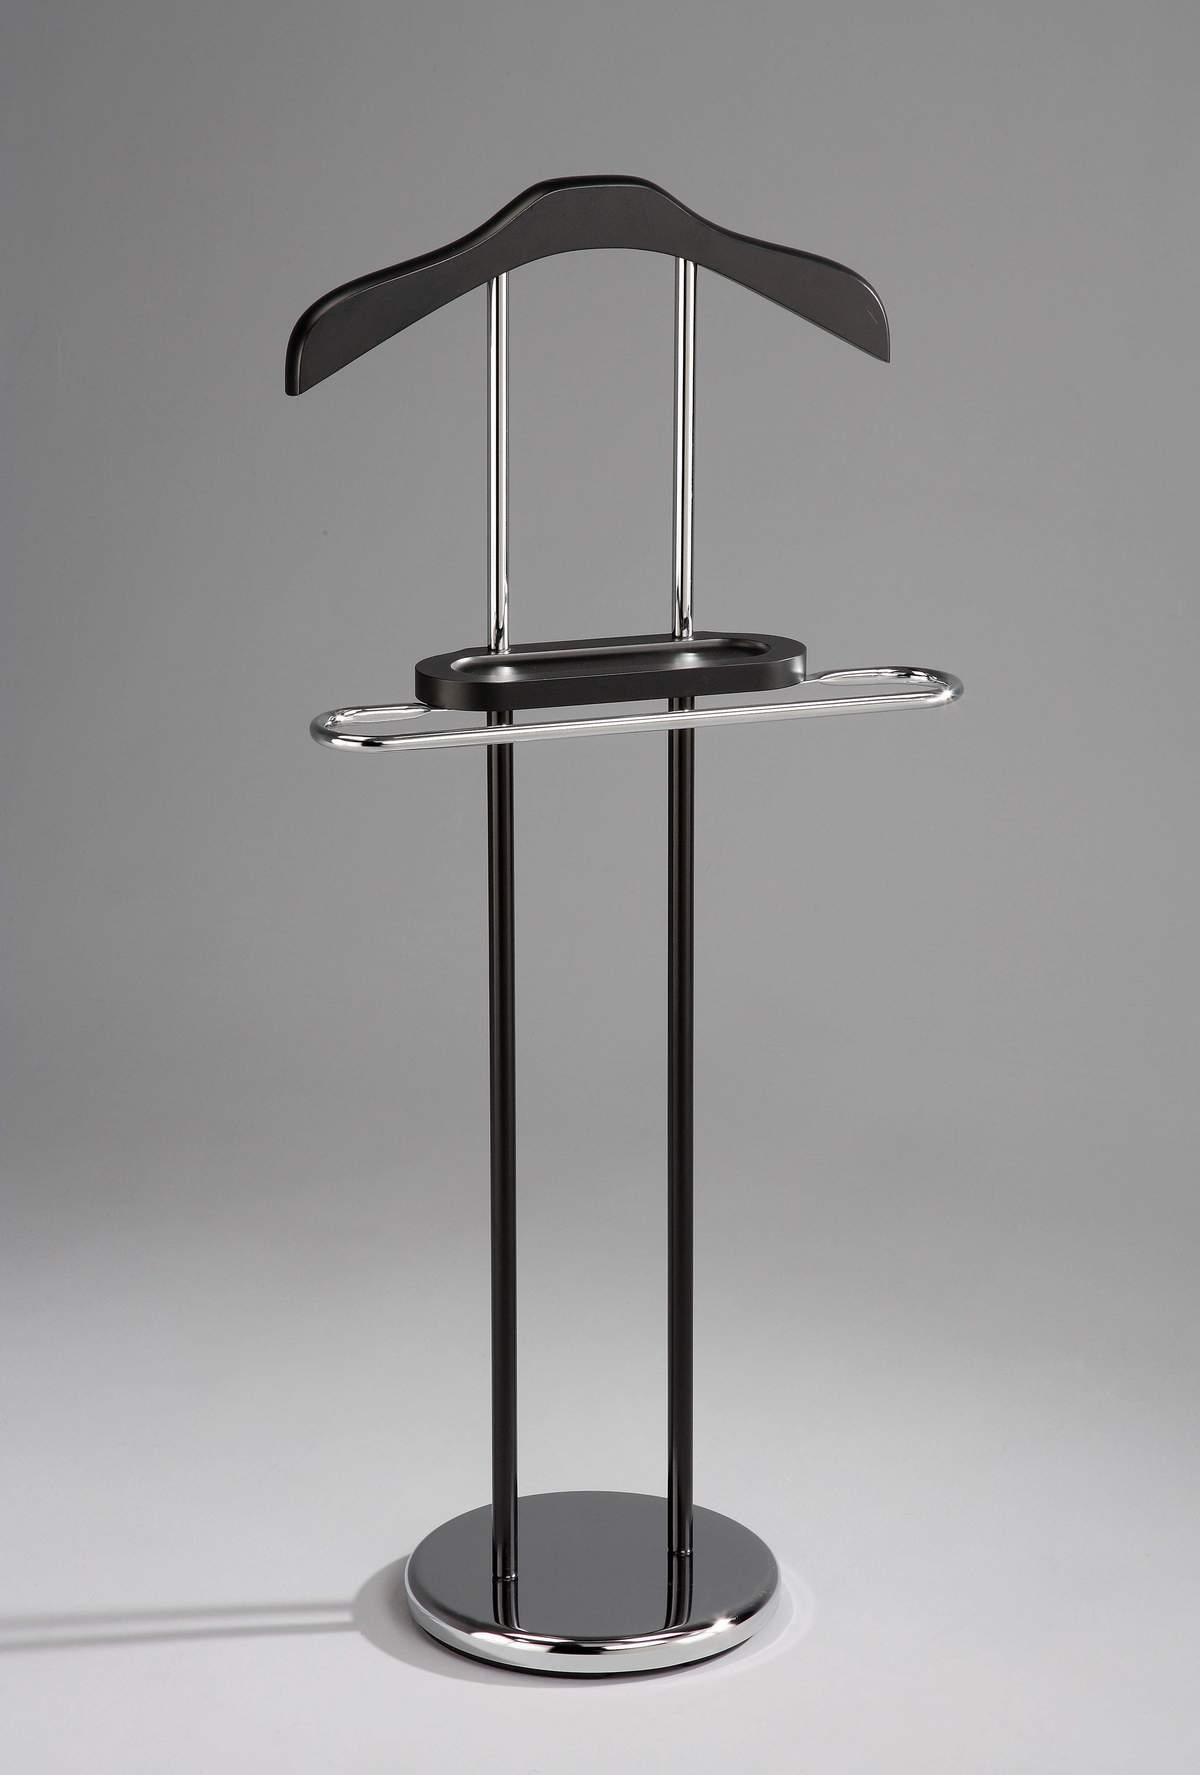 bedroom wardrobe chair valet marie bean bag sam yi furniture manufacturer in dining room home